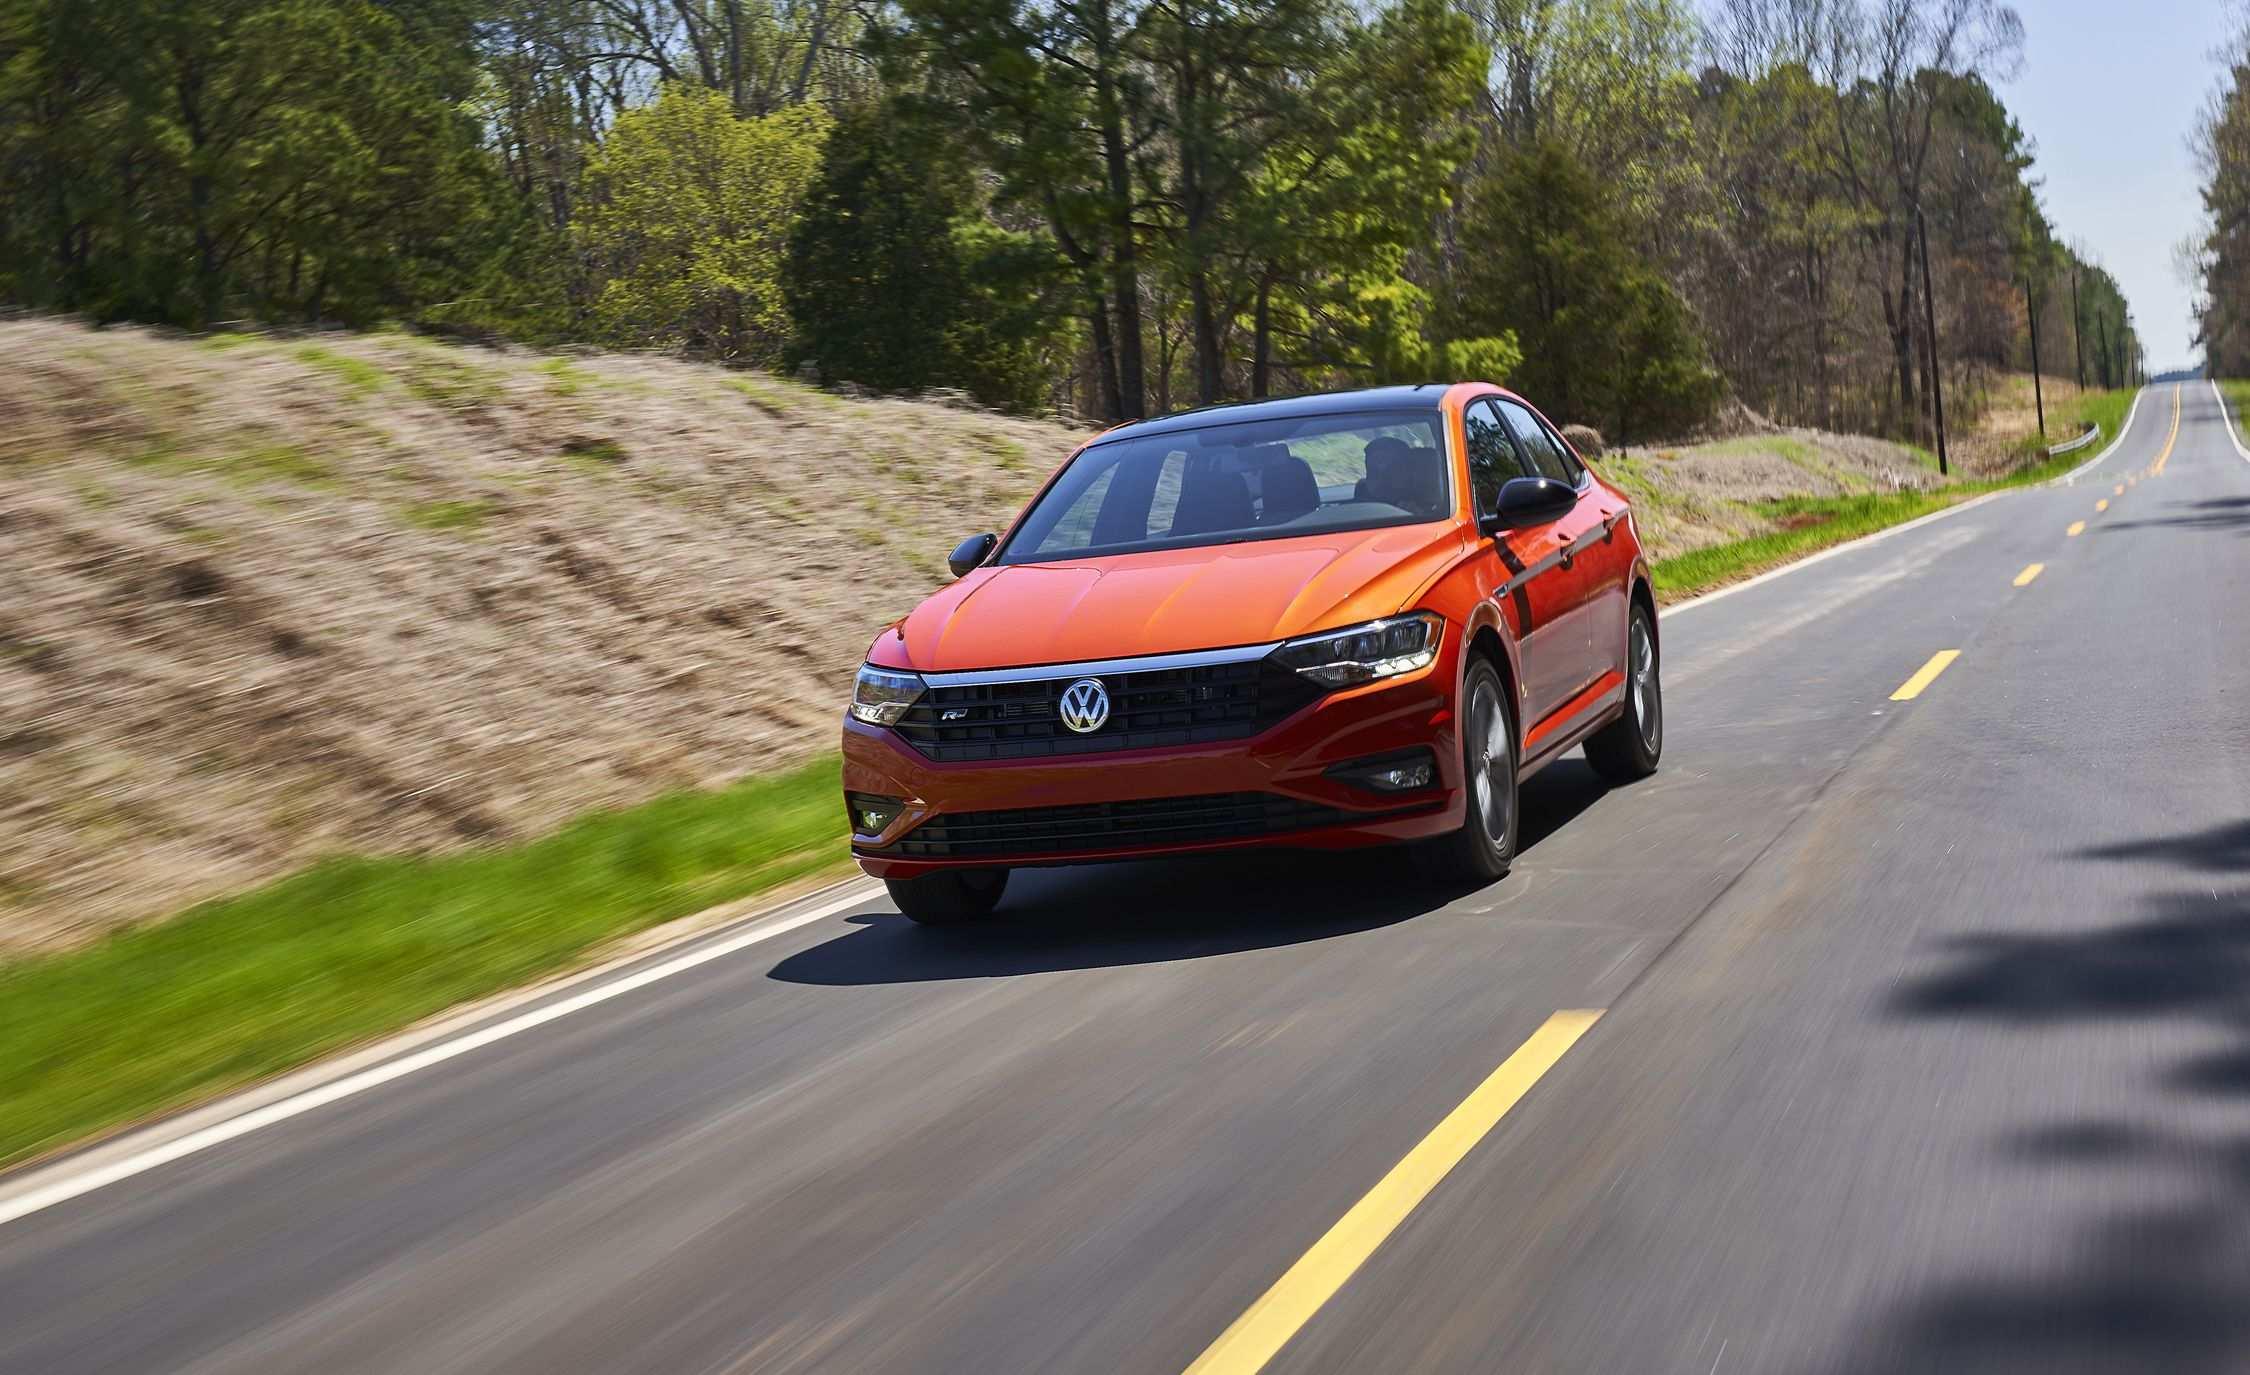 70 Best Review 2019 Volkswagen Jetta Gli Ratings with 2019 Volkswagen Jetta Gli